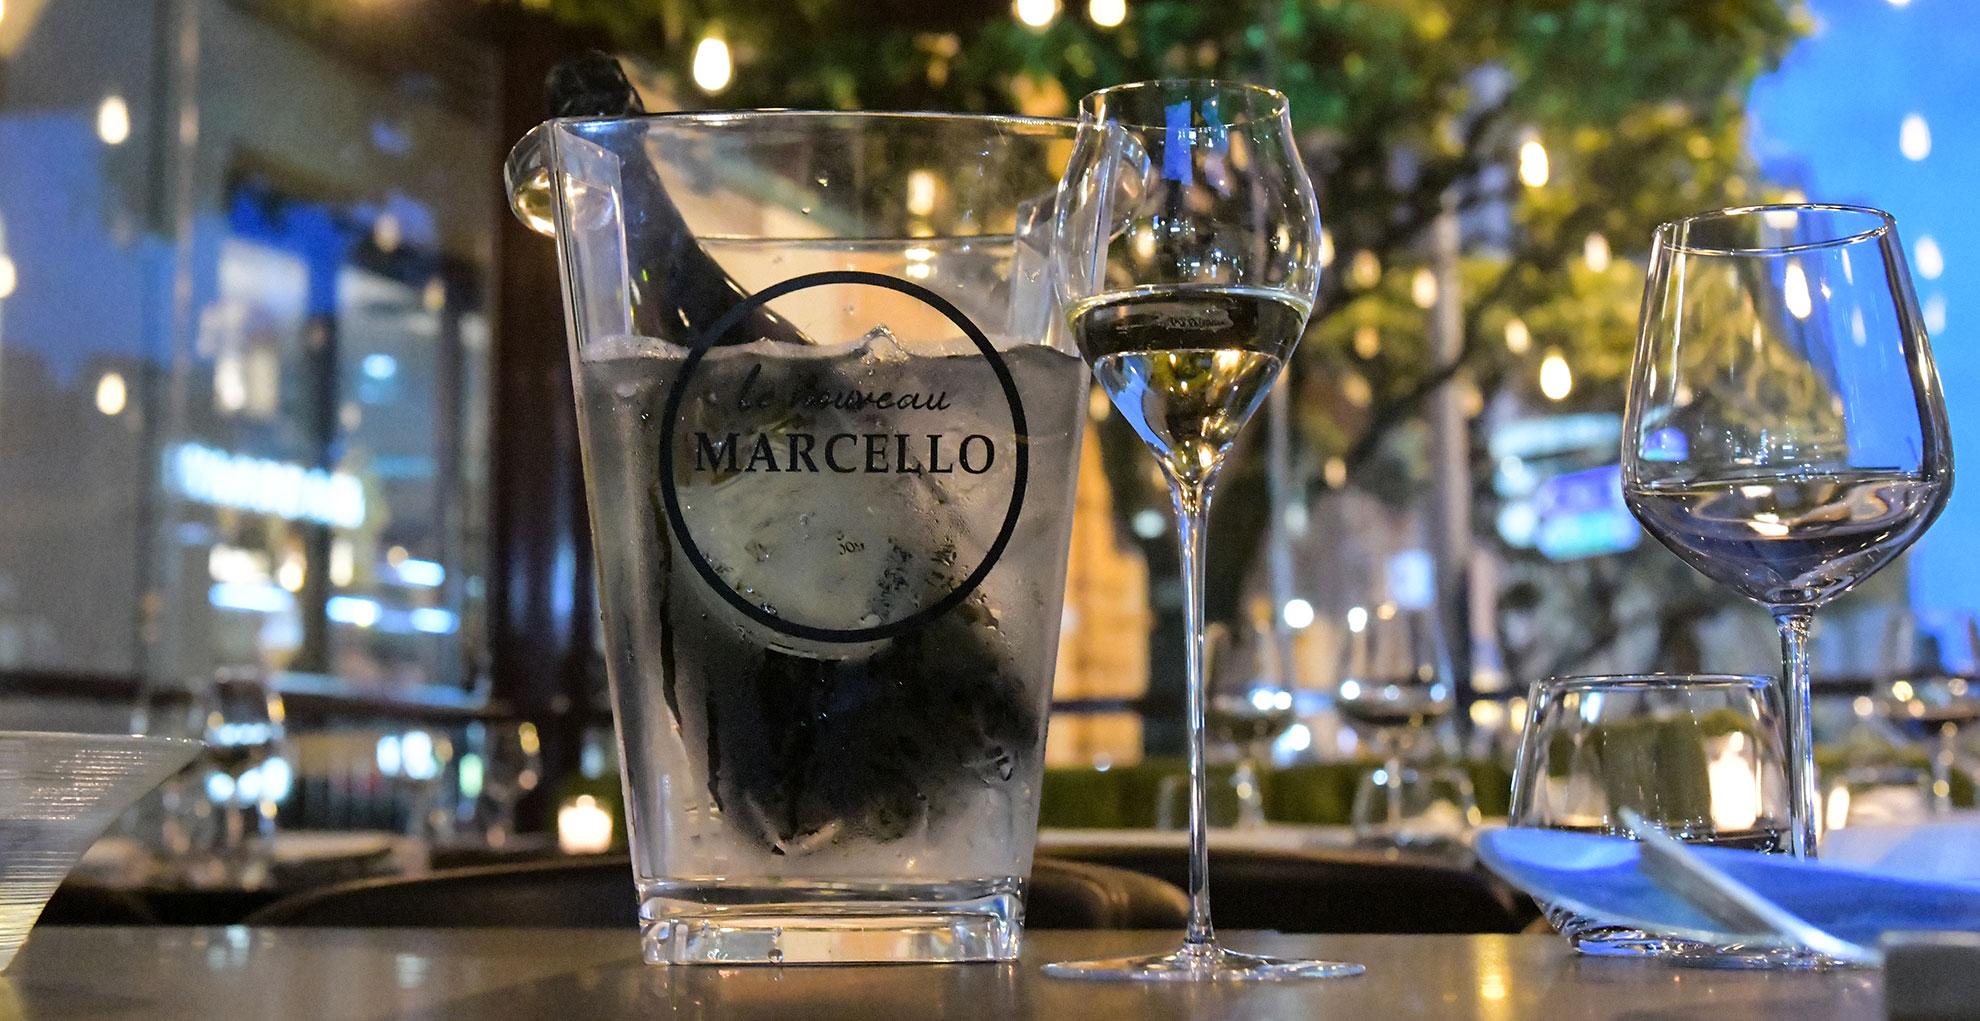 Marcello Restaurant Montecarlo - Cucina Italiana